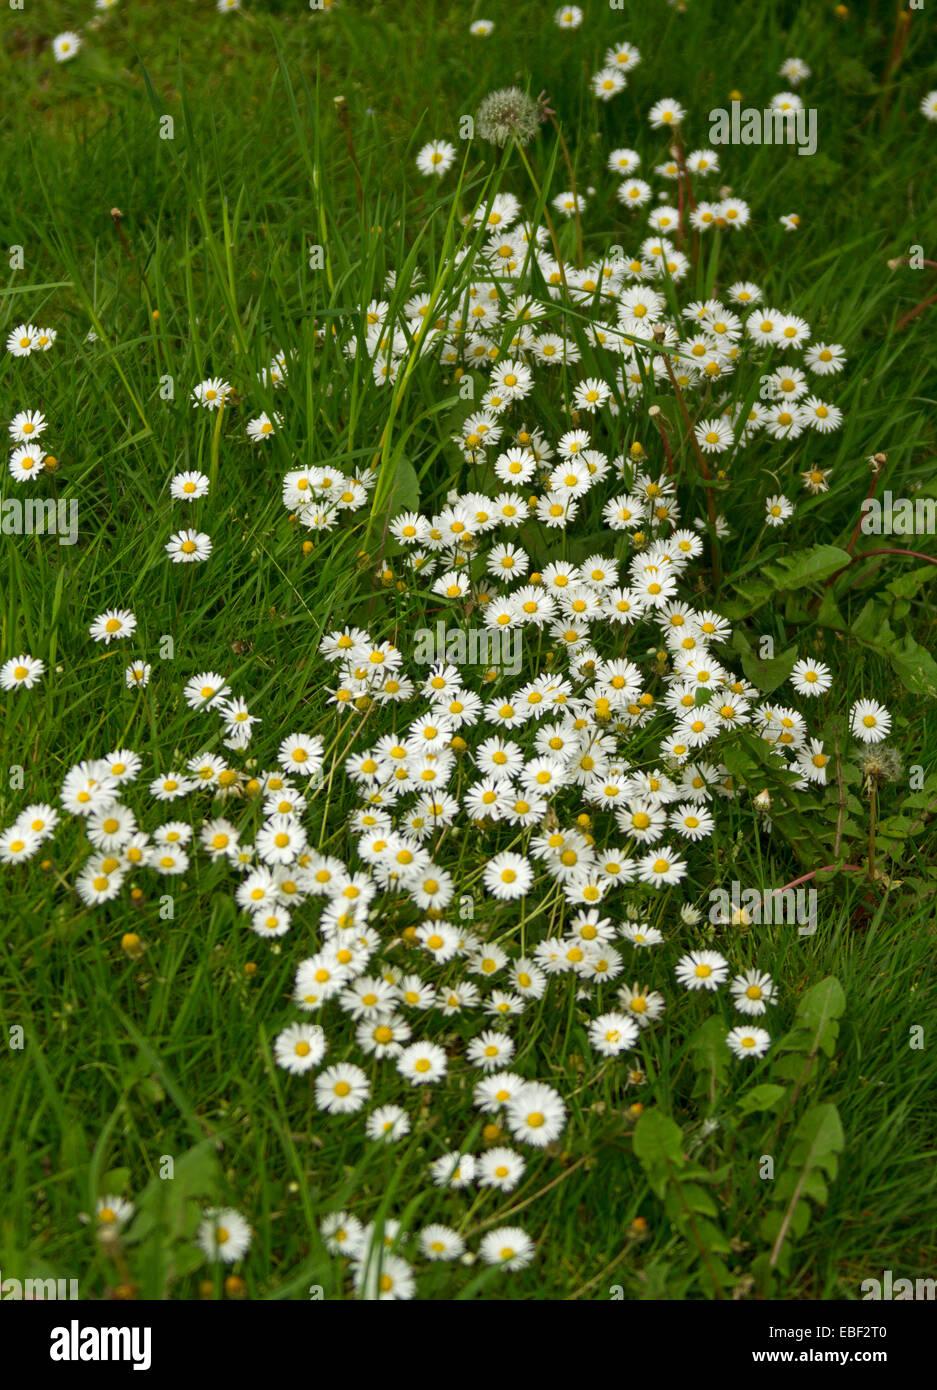 Cluster Grande De Flores Silvestres Margaritas Blancas Pequenas